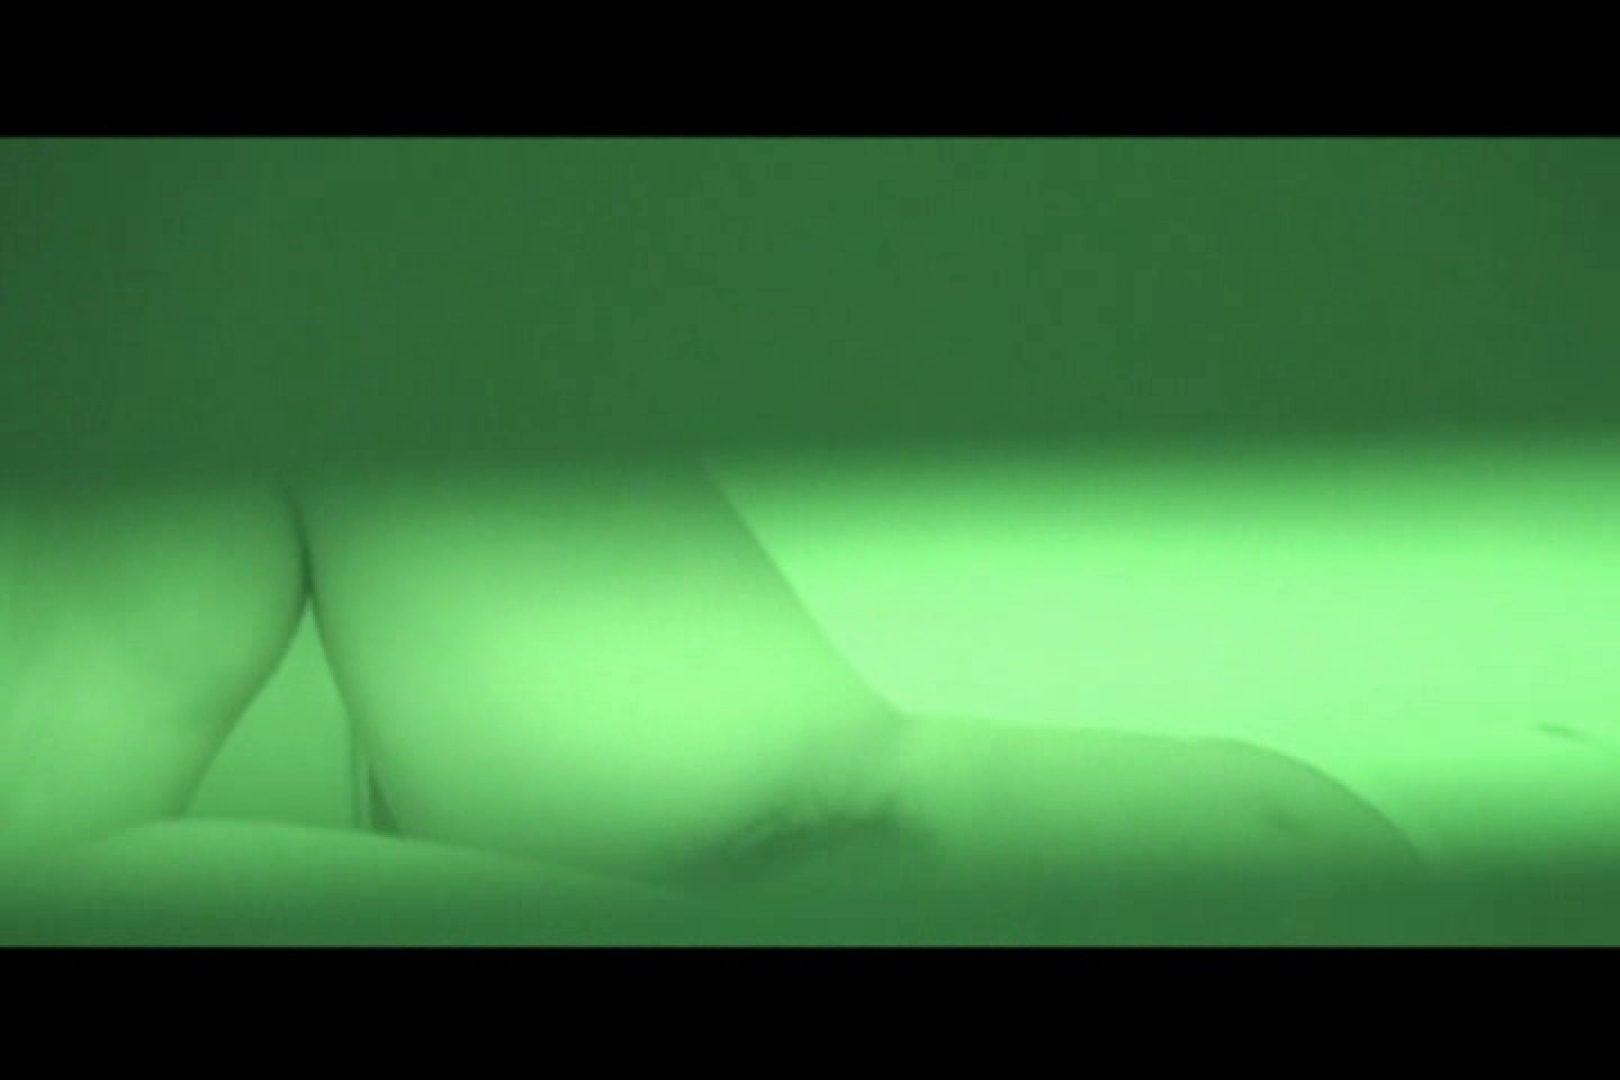 独占配信!無修正! 看護女子寮 vol.12 ナースのエロ動画 SEX無修正画像 78PIX 14